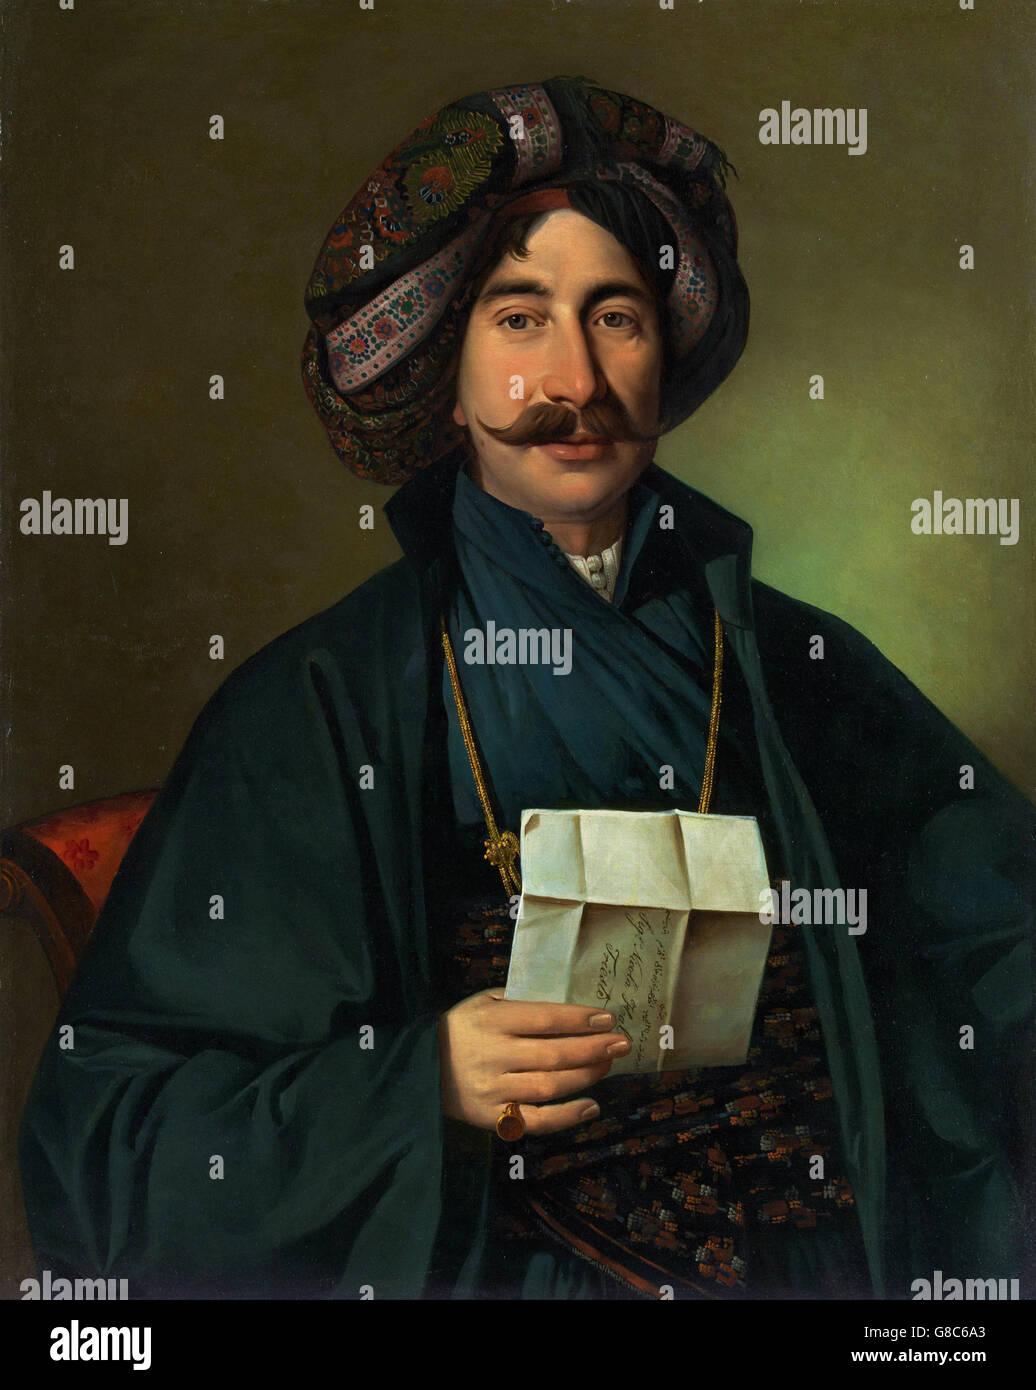 Jožef Tominc - Man in Ottoman dress - Stock Image